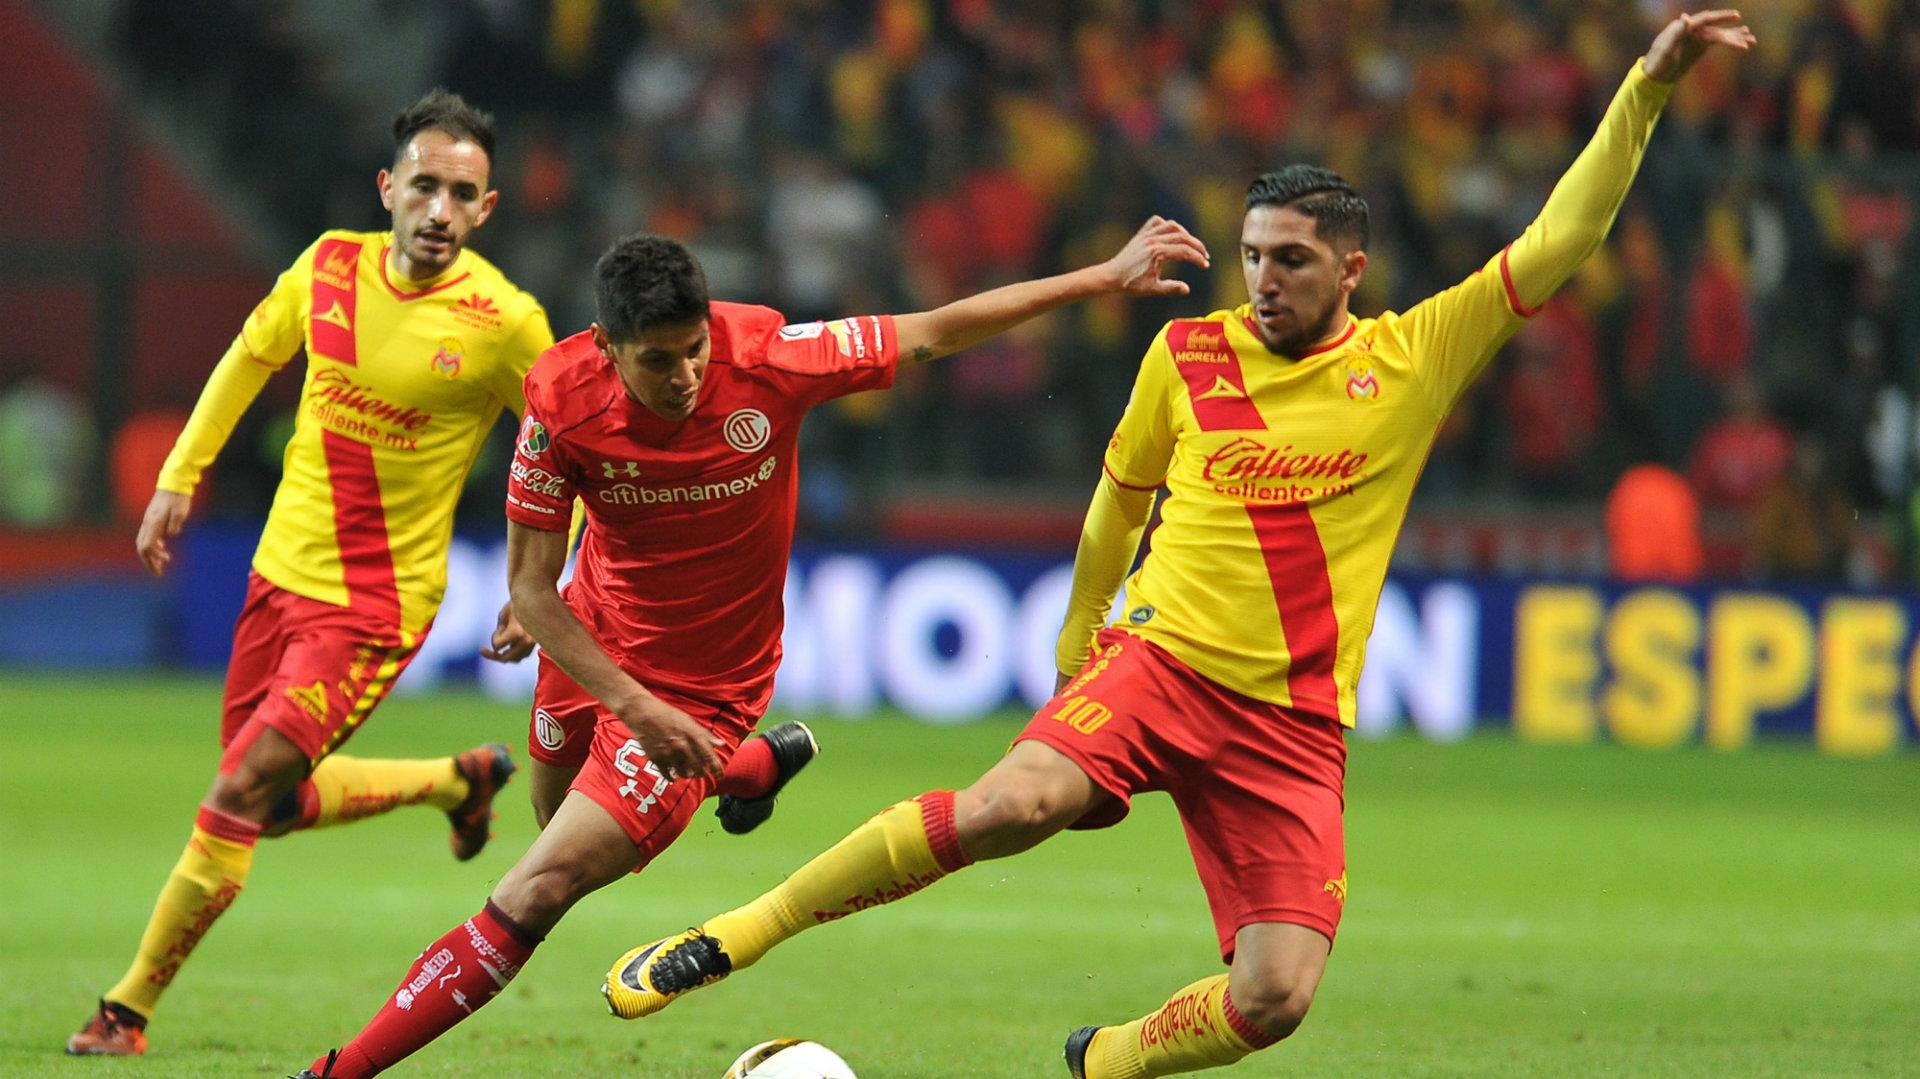 Liga MX playoffs: Toluca's furious rally keeps Red Devils